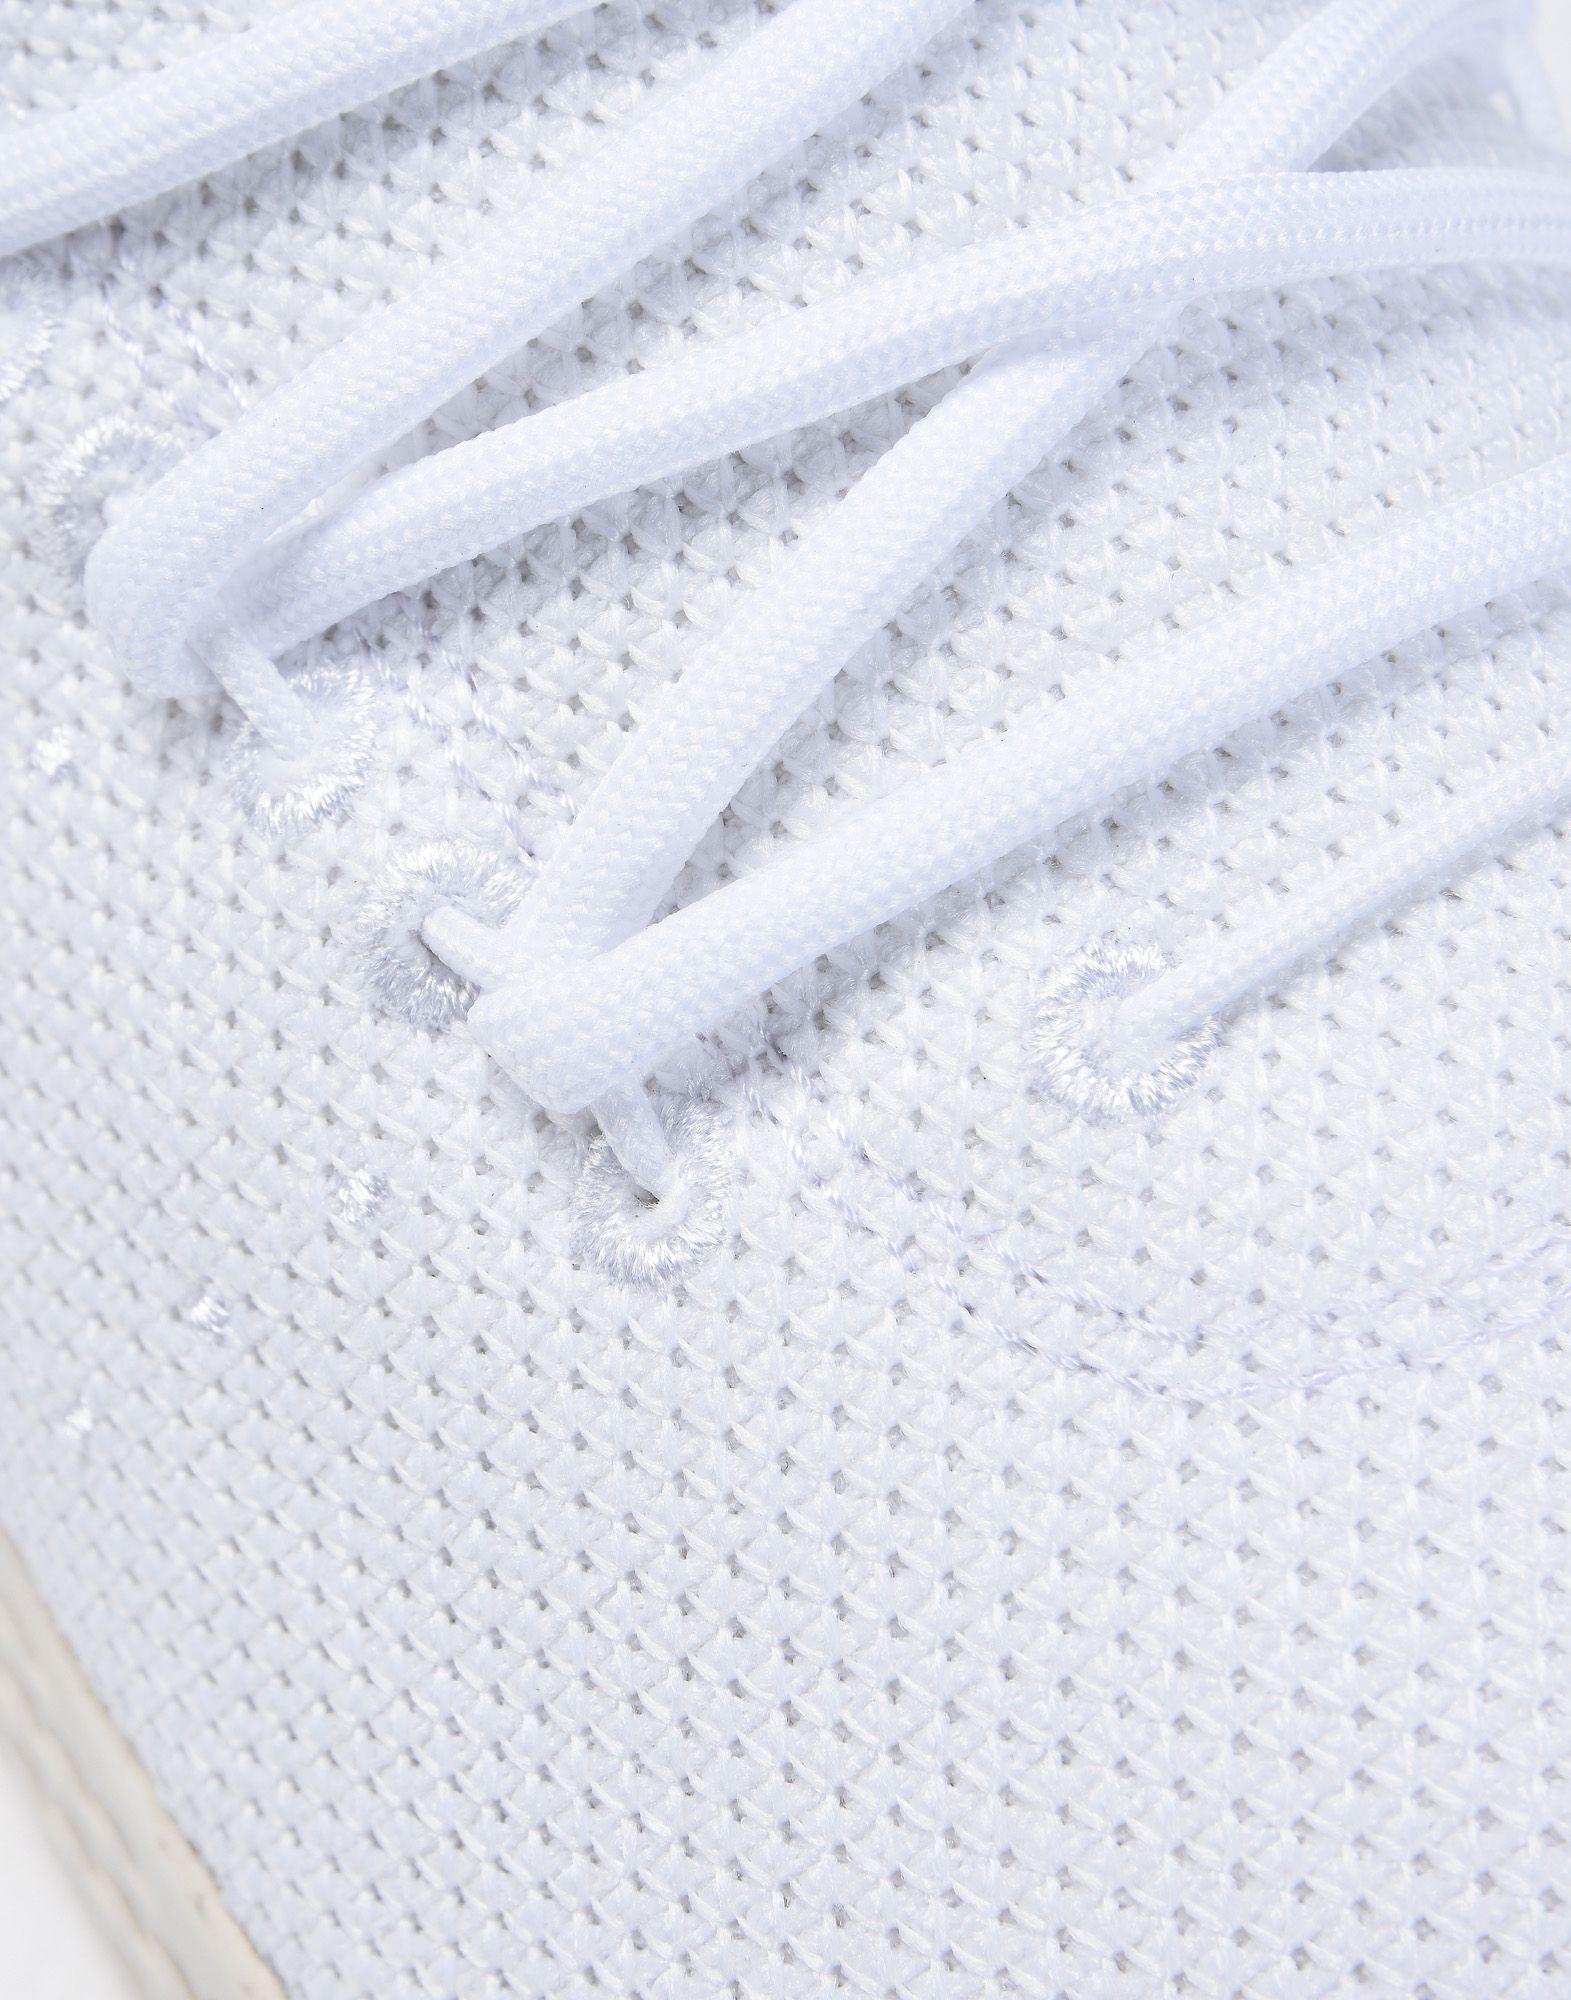 Adidas Originals By Pharrell sich Williams Pw Tennis Hu Gutes Preis-Leistungs-Verhältnis, es lohnt sich Pharrell 4b13b5